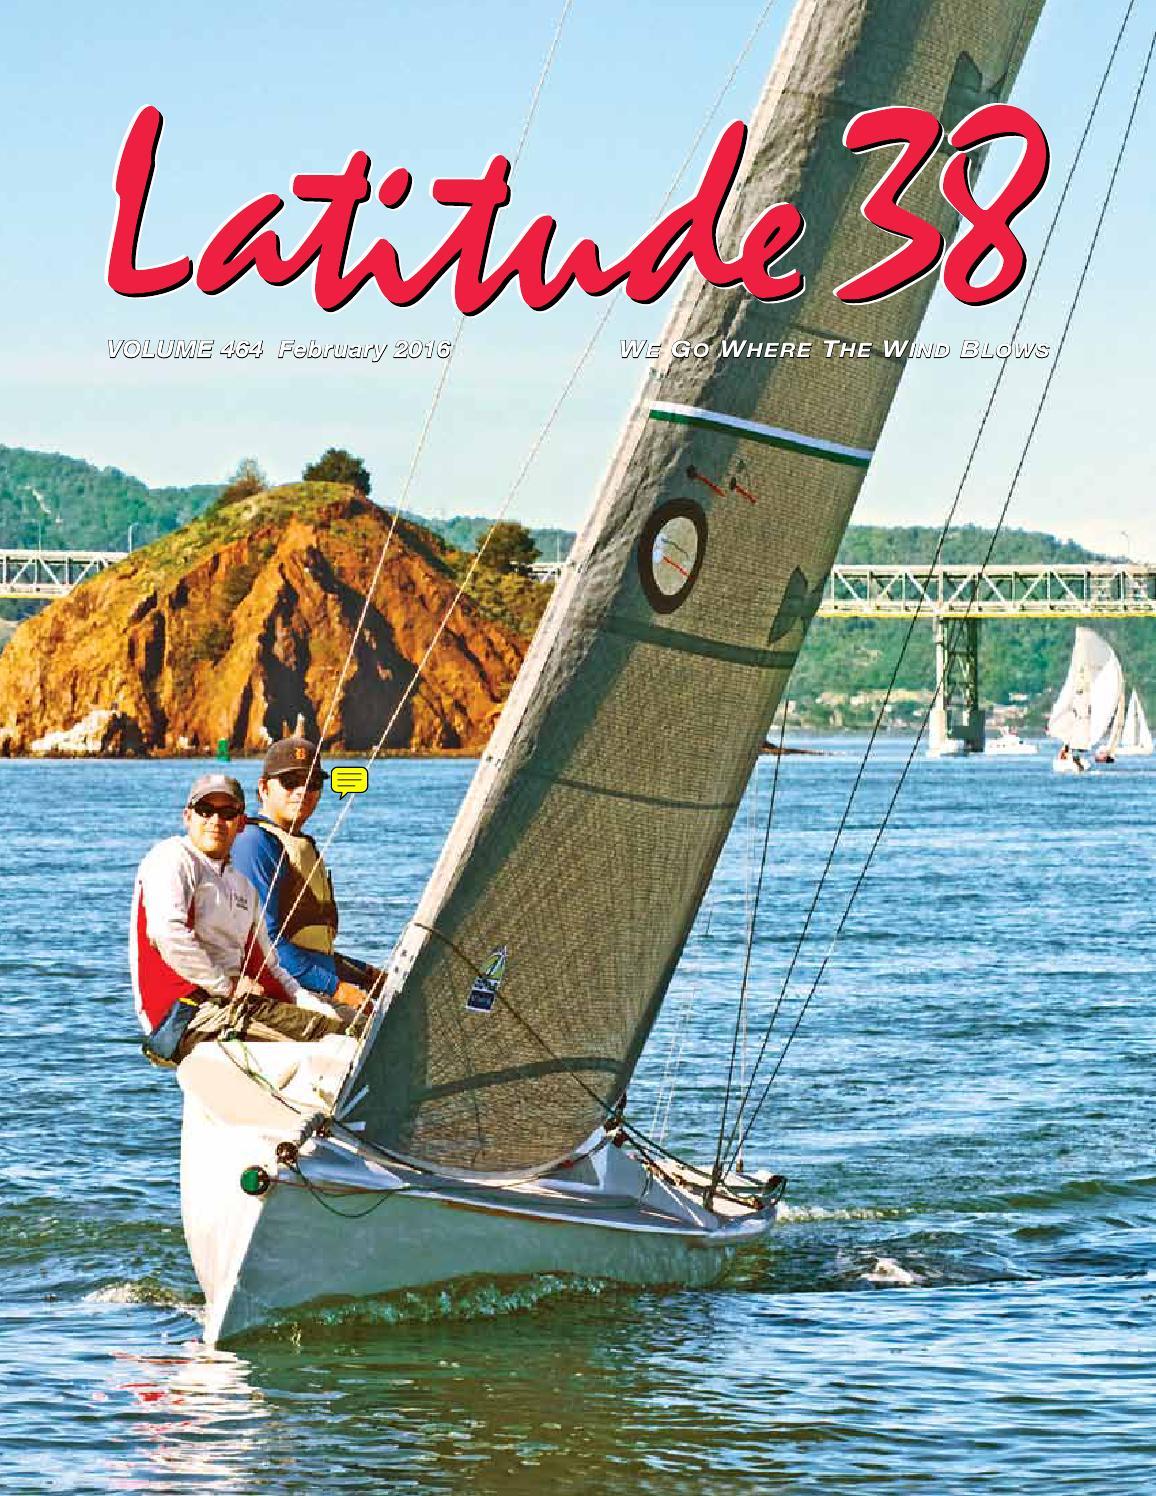 Latitude 38 feb 2016 by latitude 38 media llc issuu fandeluxe Images